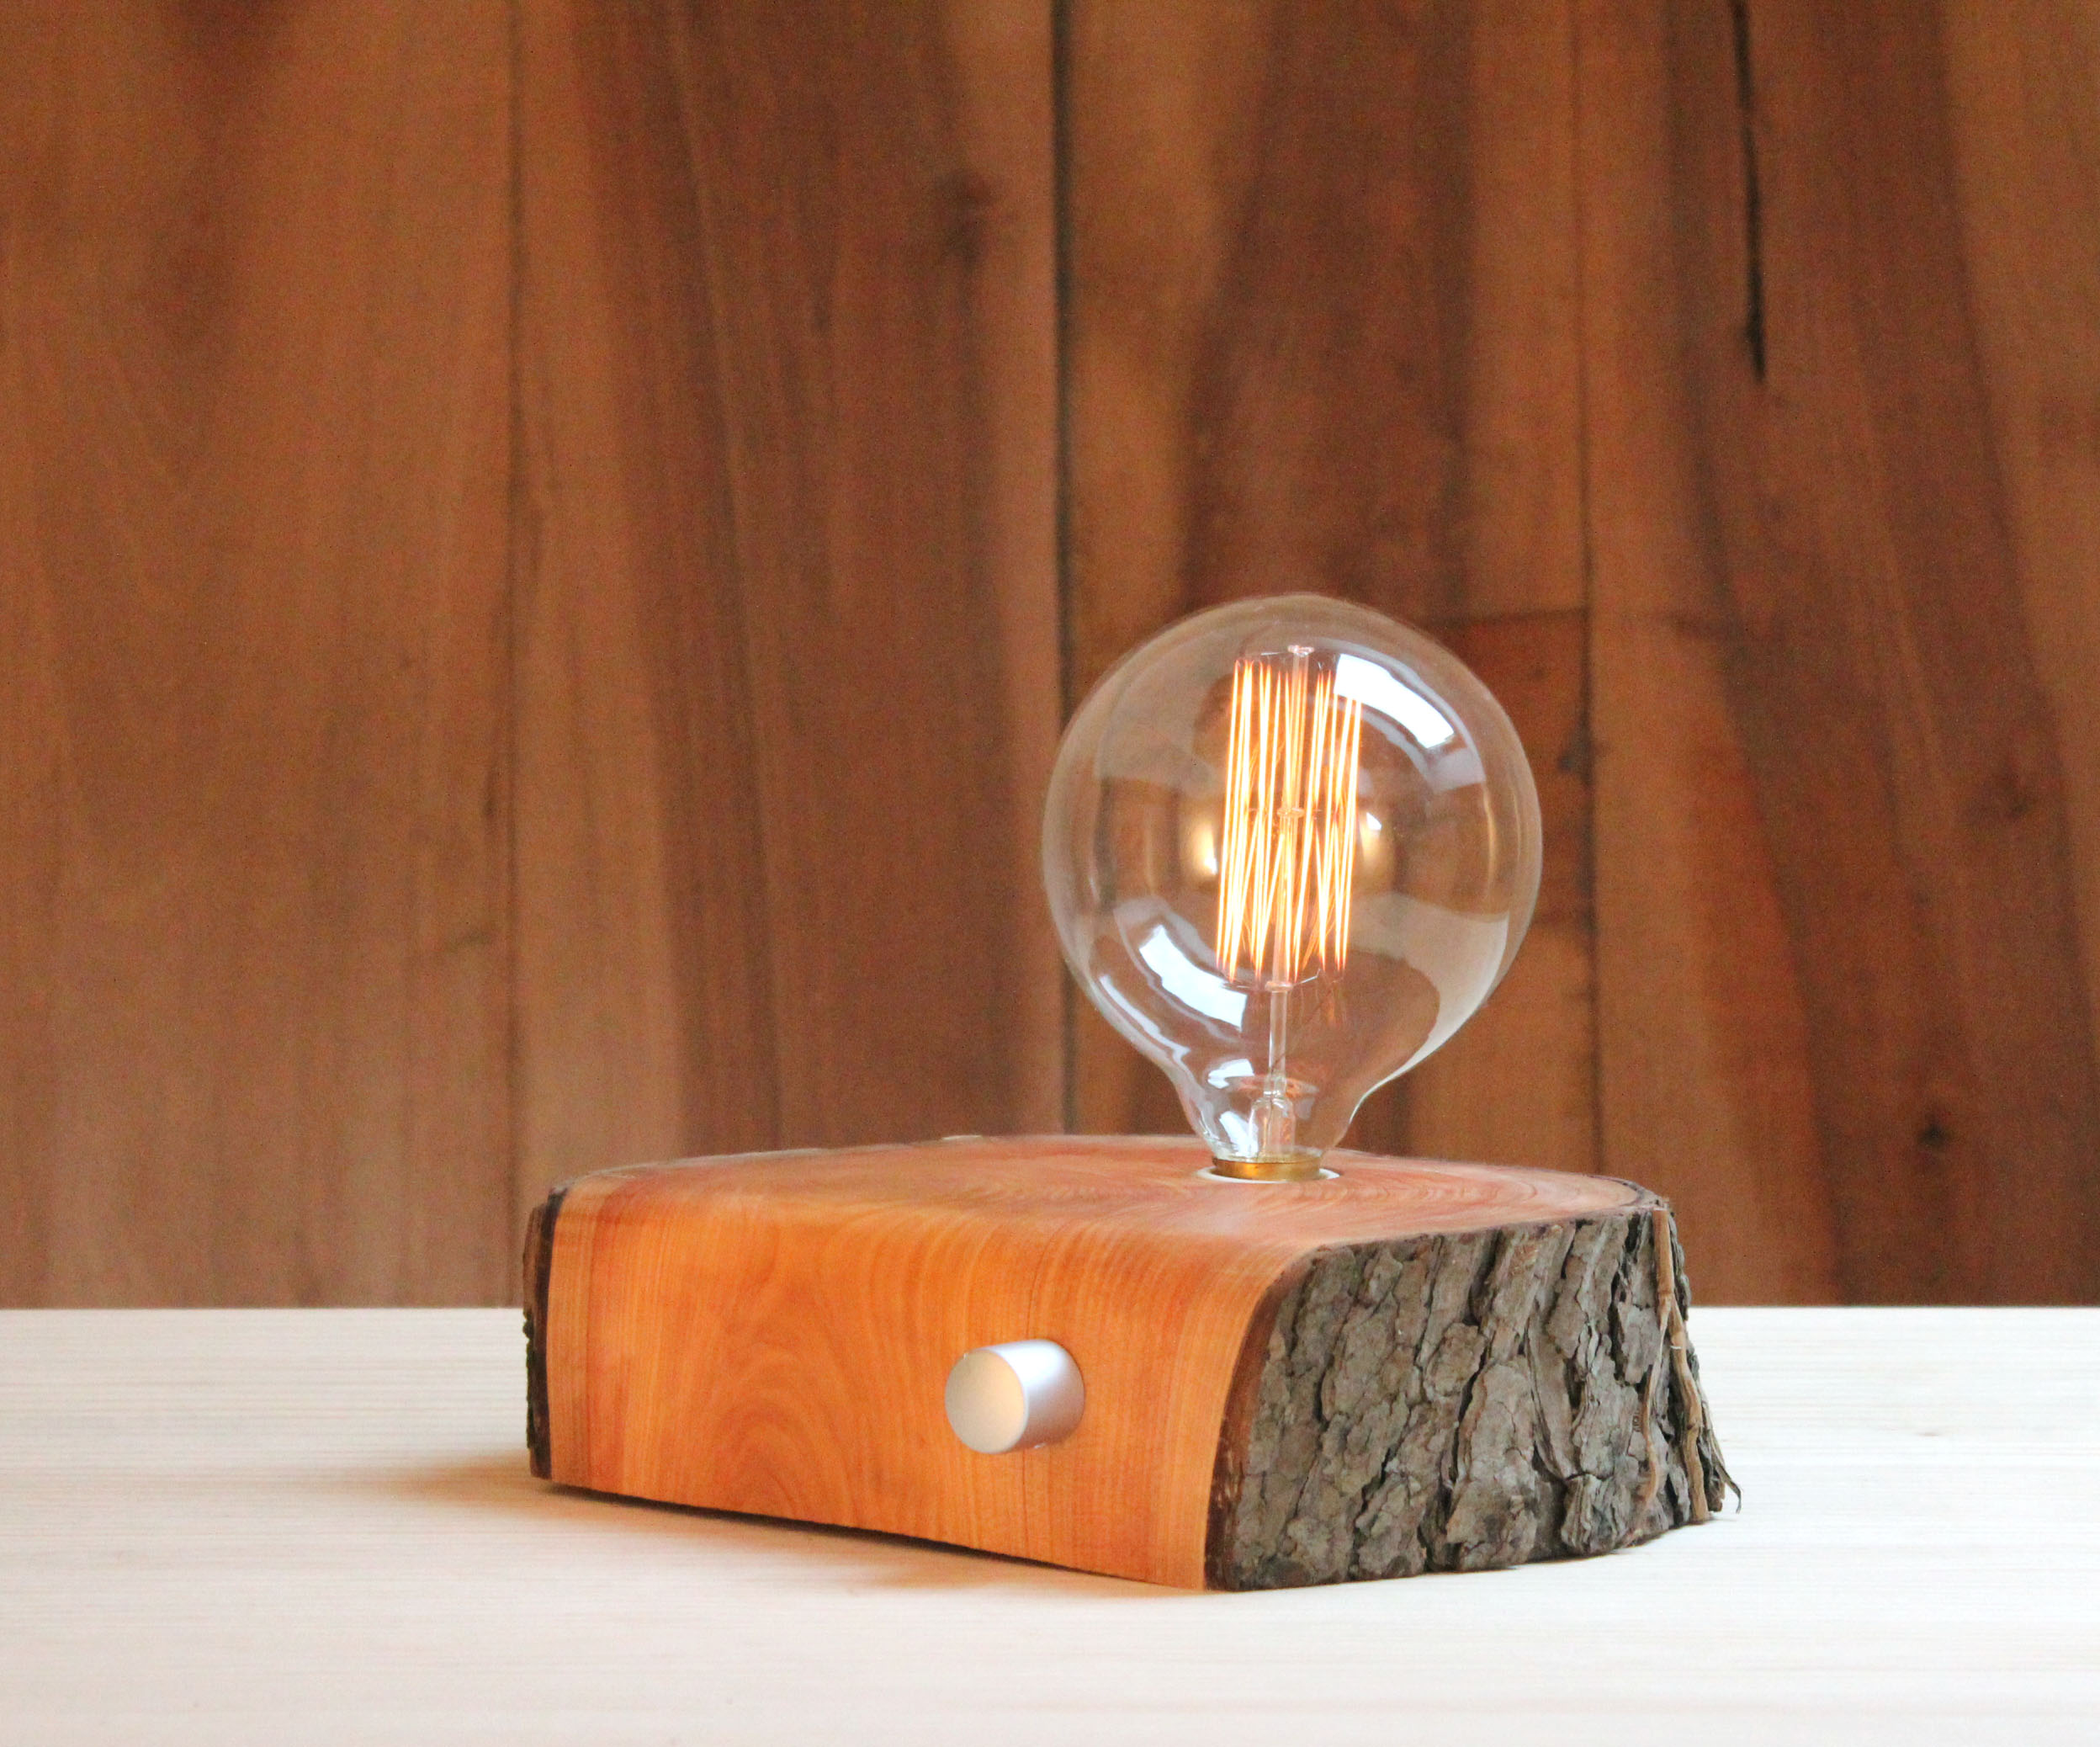 lampara de madera reciclada BRZwooDesign 12